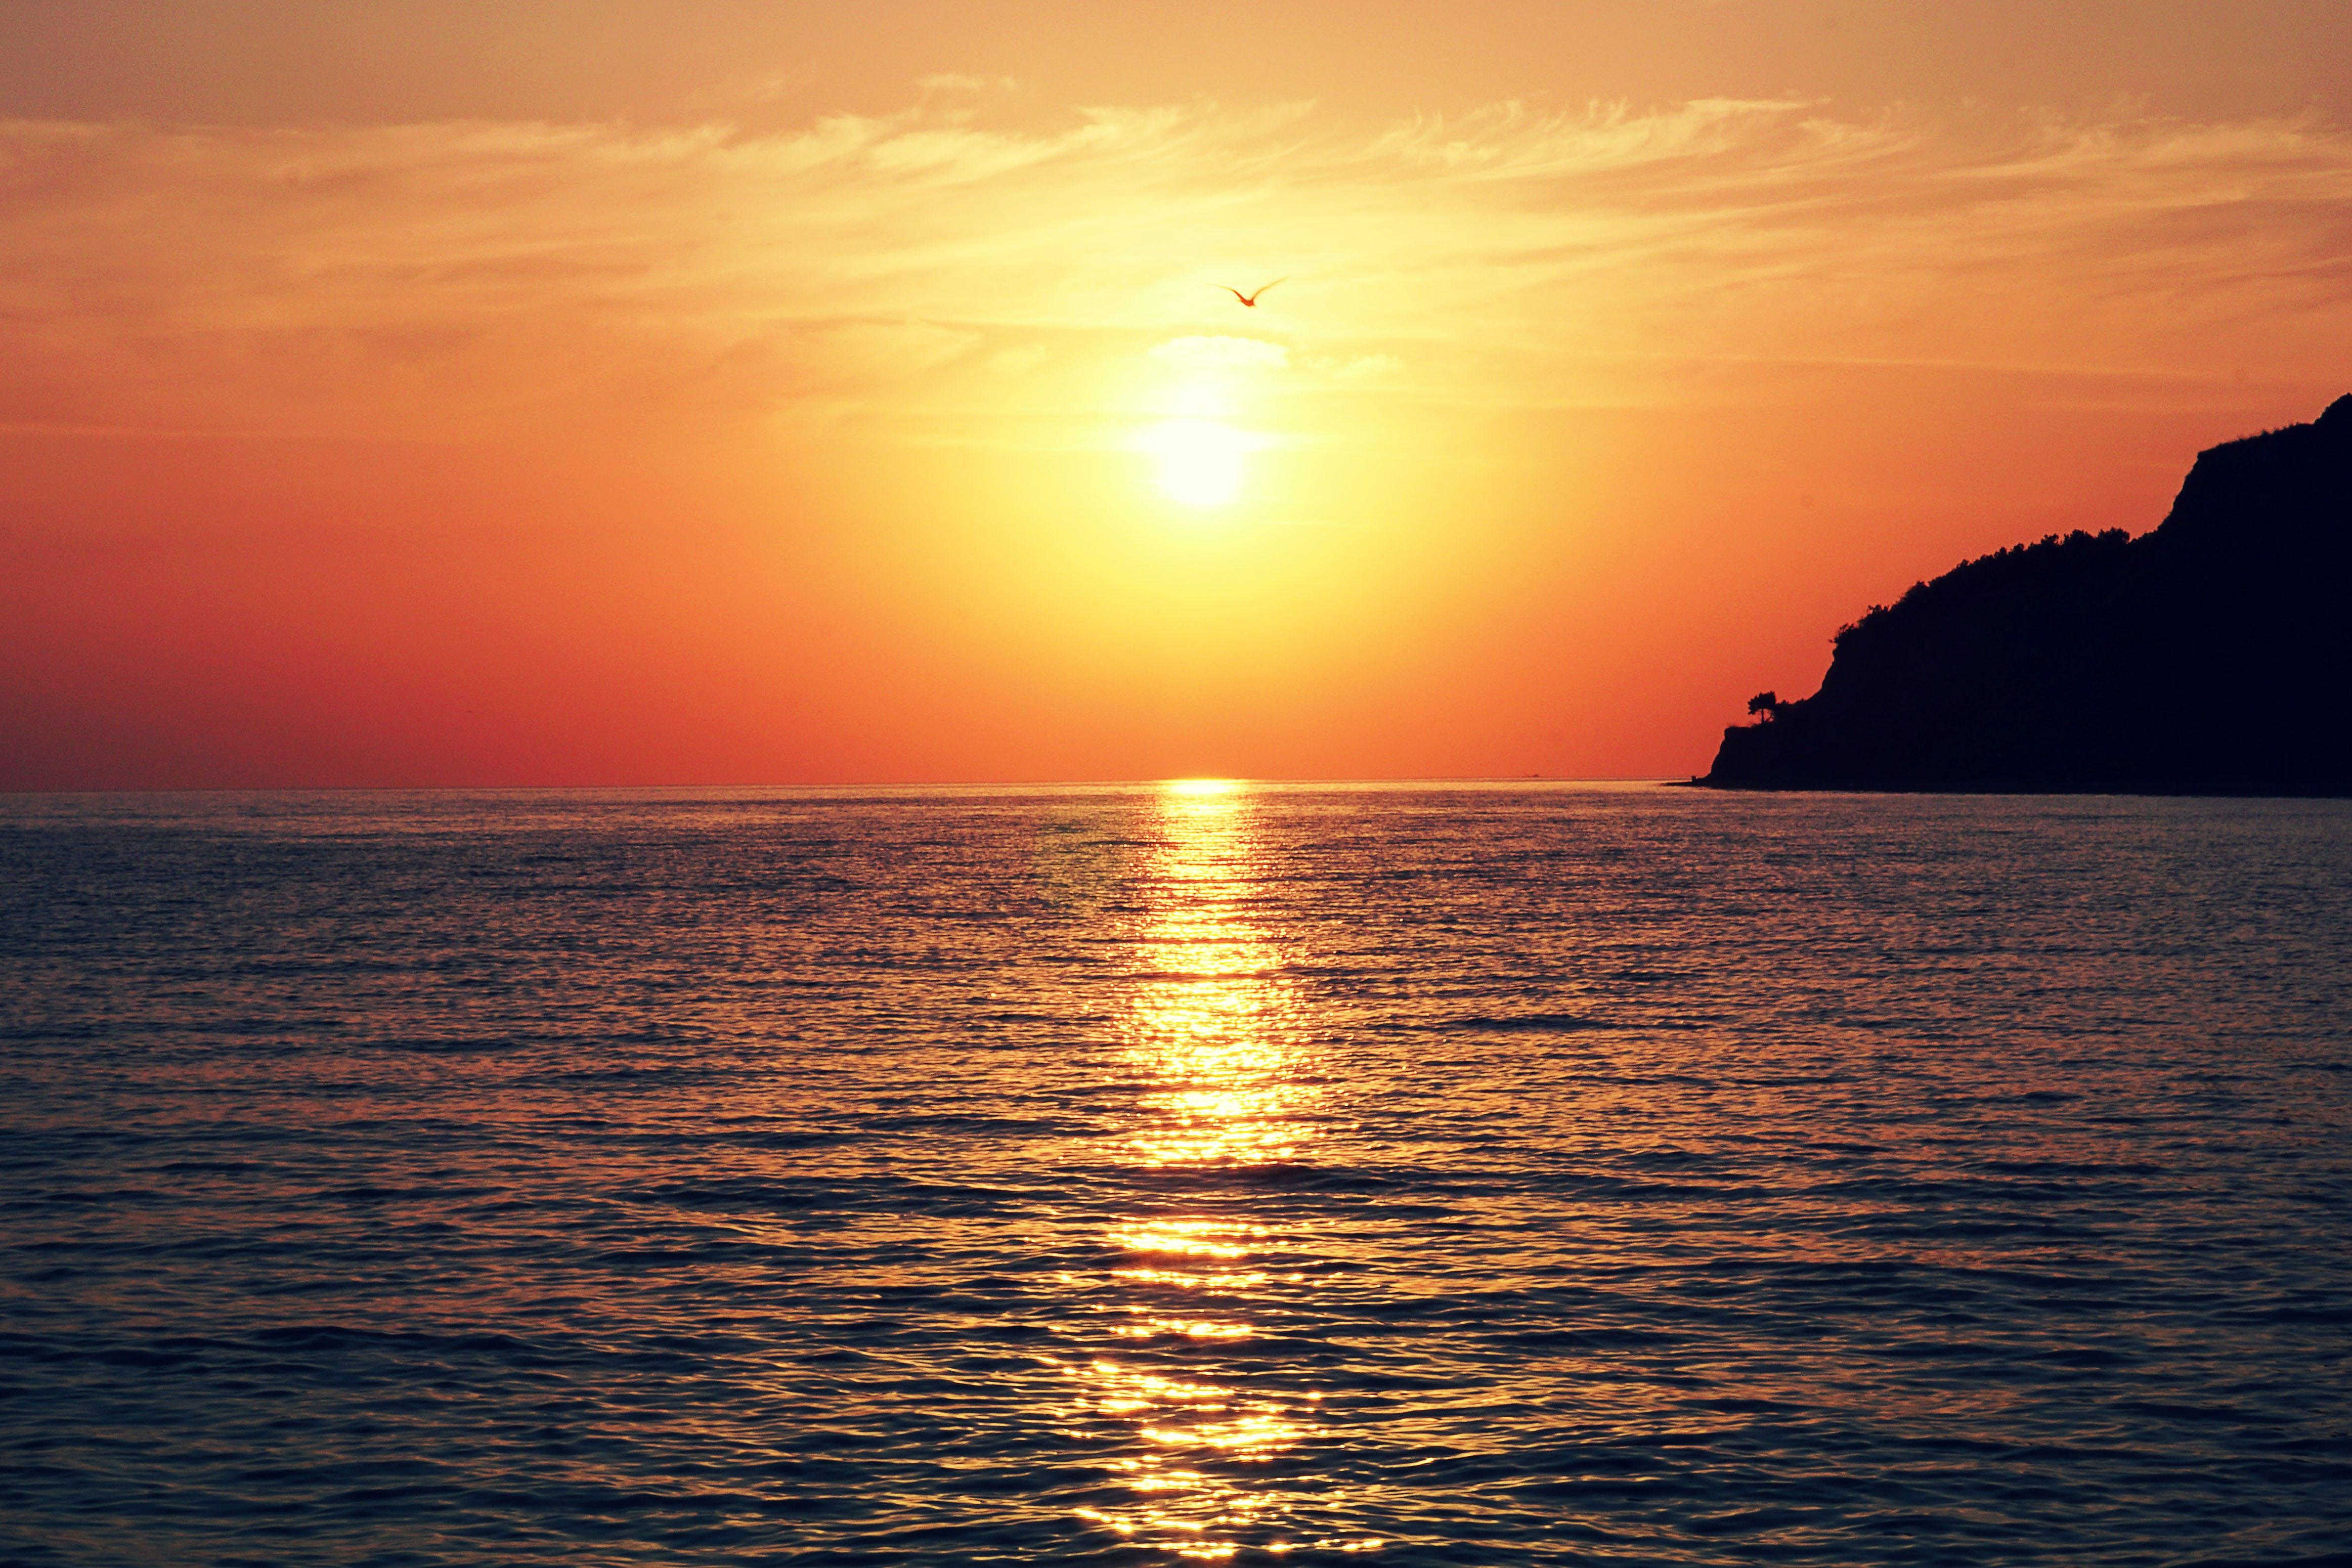 afterglow, backlit, beach